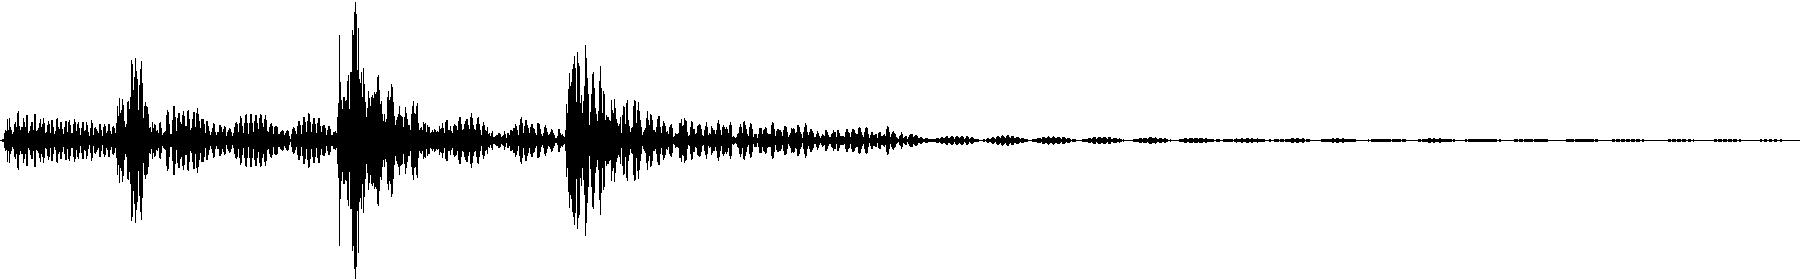 sfj 130 bpm drum fill 01